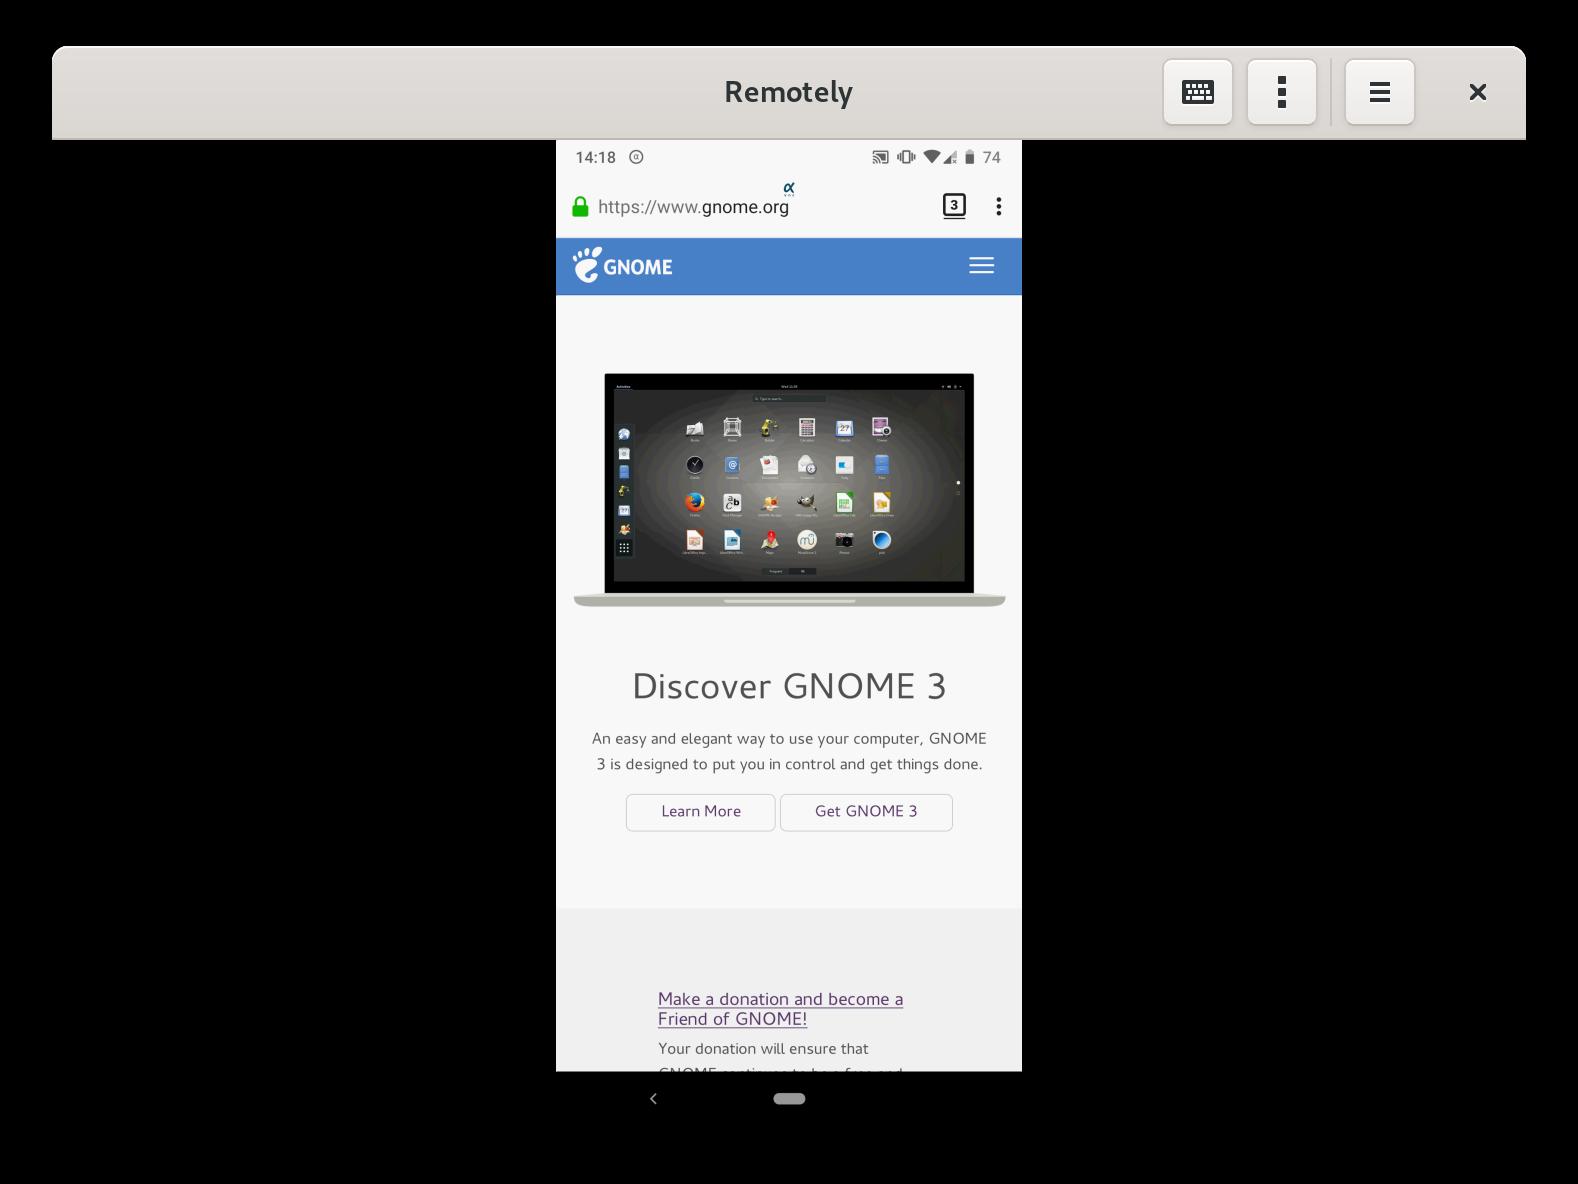 data/screenshots/1.png